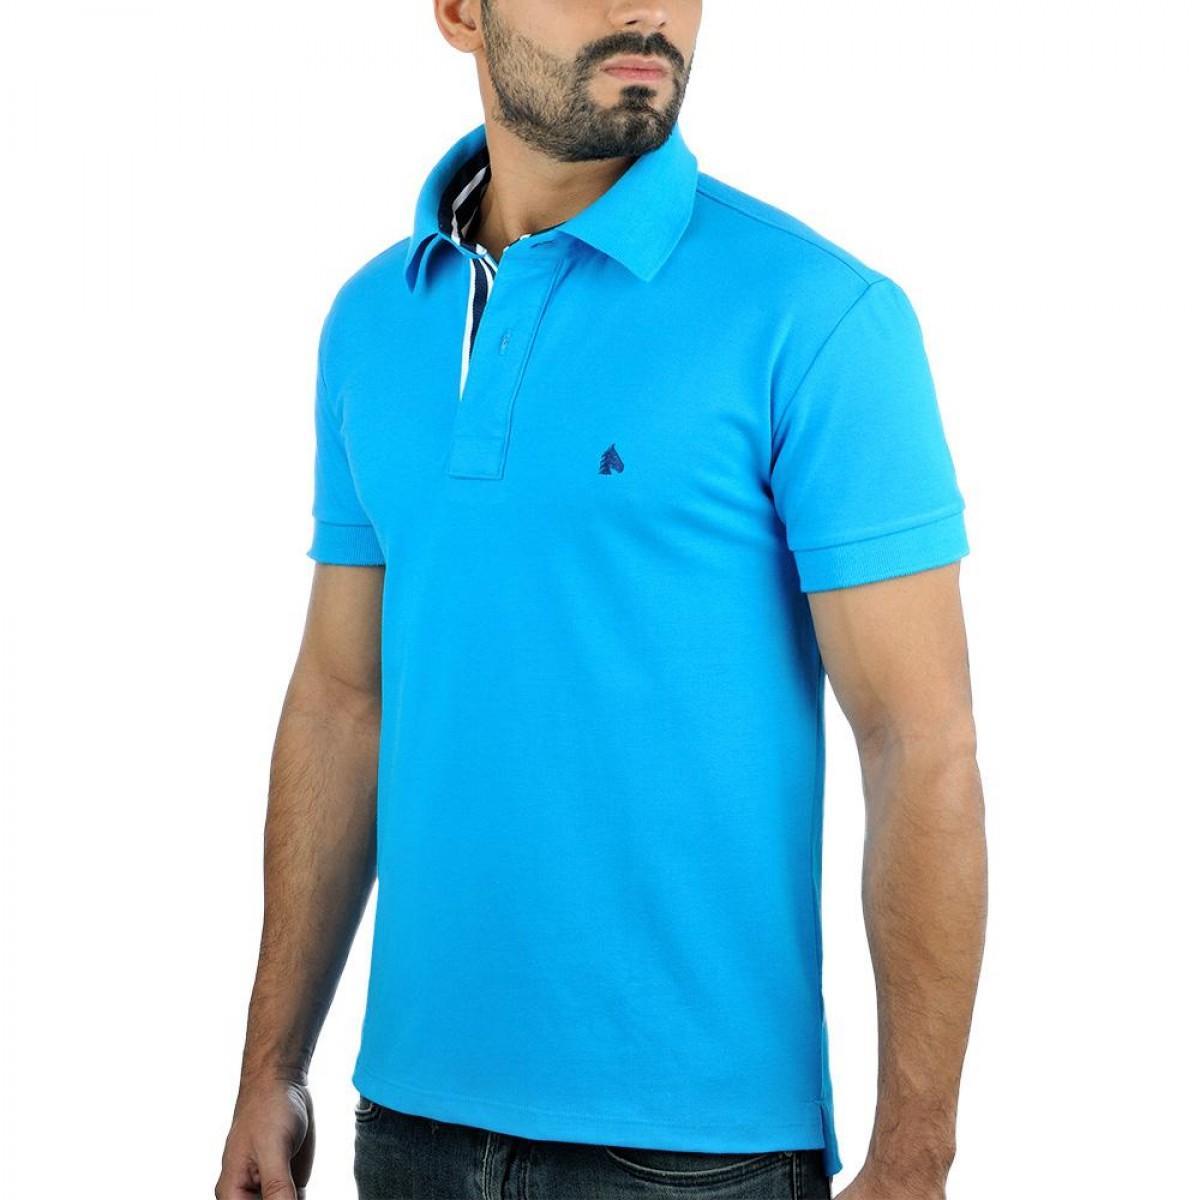 151445f740fe0 Camisa Polo BF   MS Azul - BF   MS